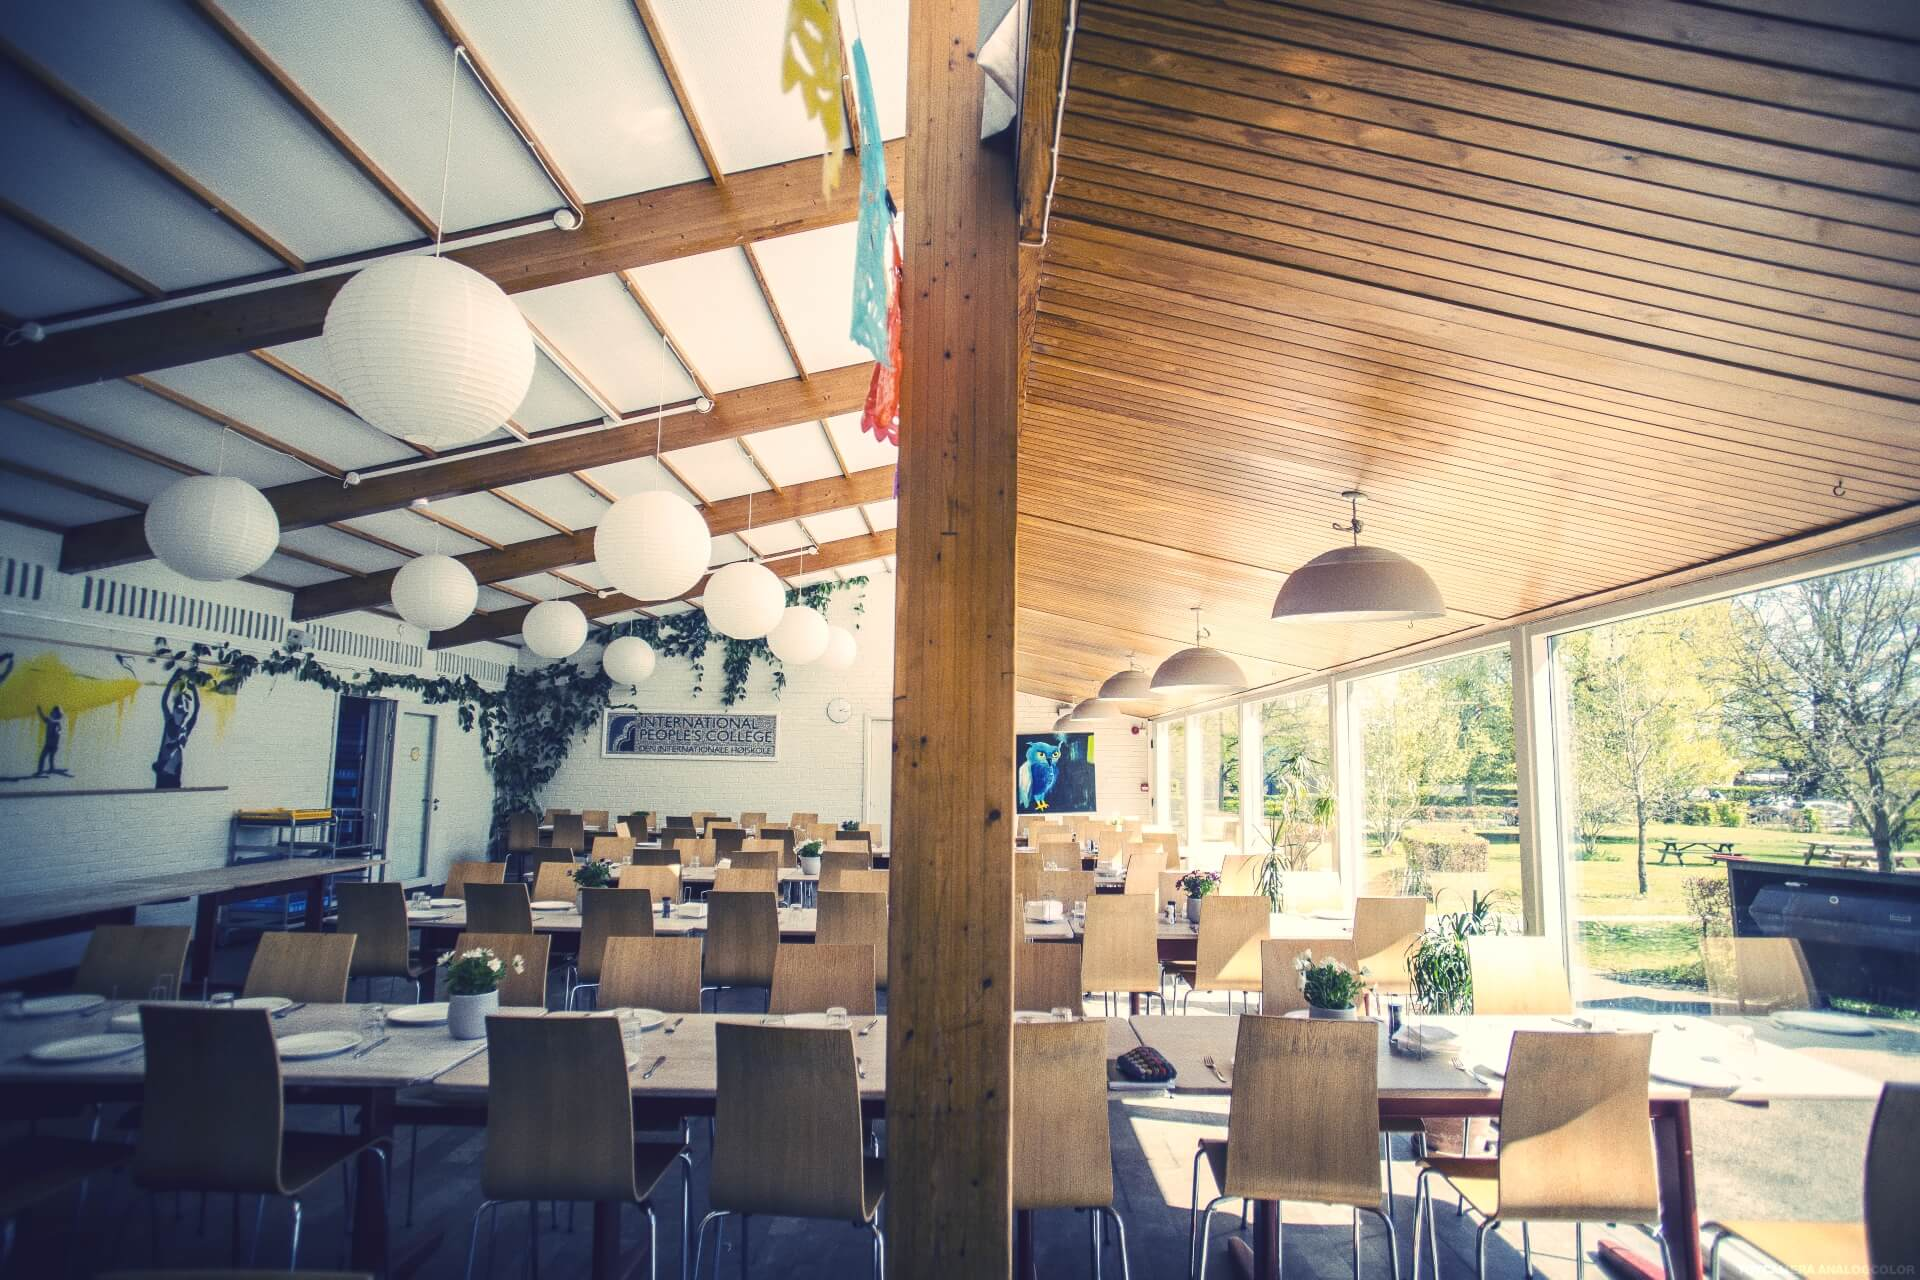 Folk high school Dining hall at International People's College in Denmark 1